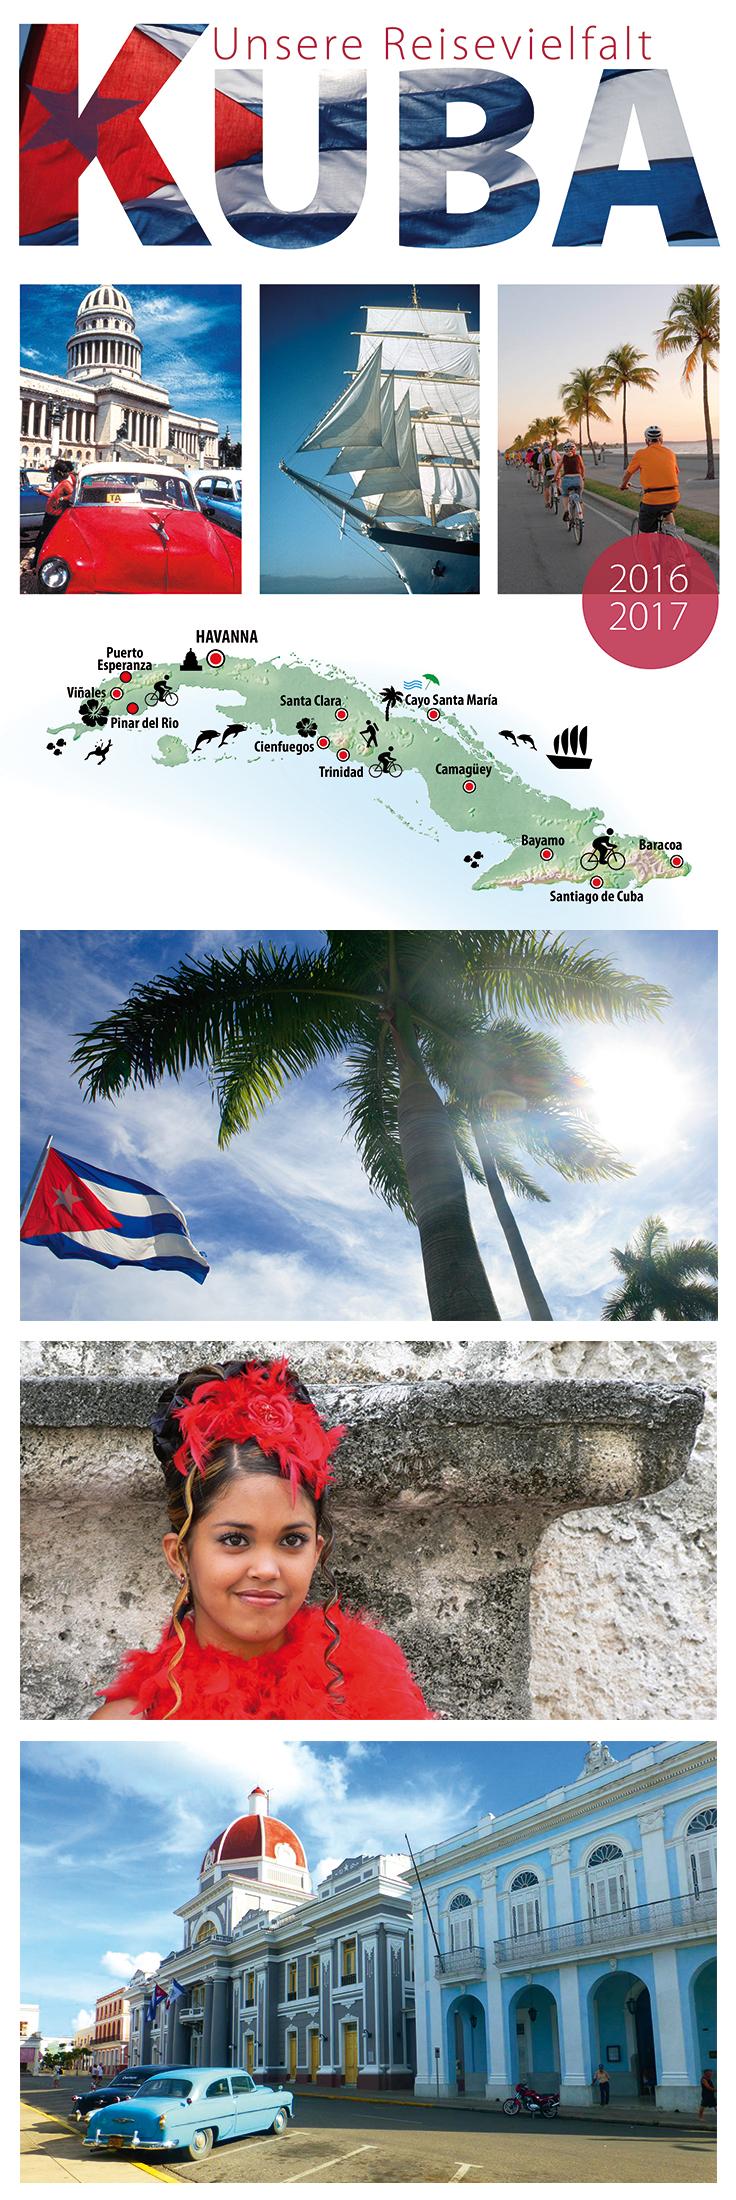 #Kuba #cuba #reisen #rundreise #kreuzfahrt #aktivreisen #aktivreisen #singlereisen #reisevielfalt #havanna #trinidad #cienfuegos #vinales #santaclara #bayamo #baracoa